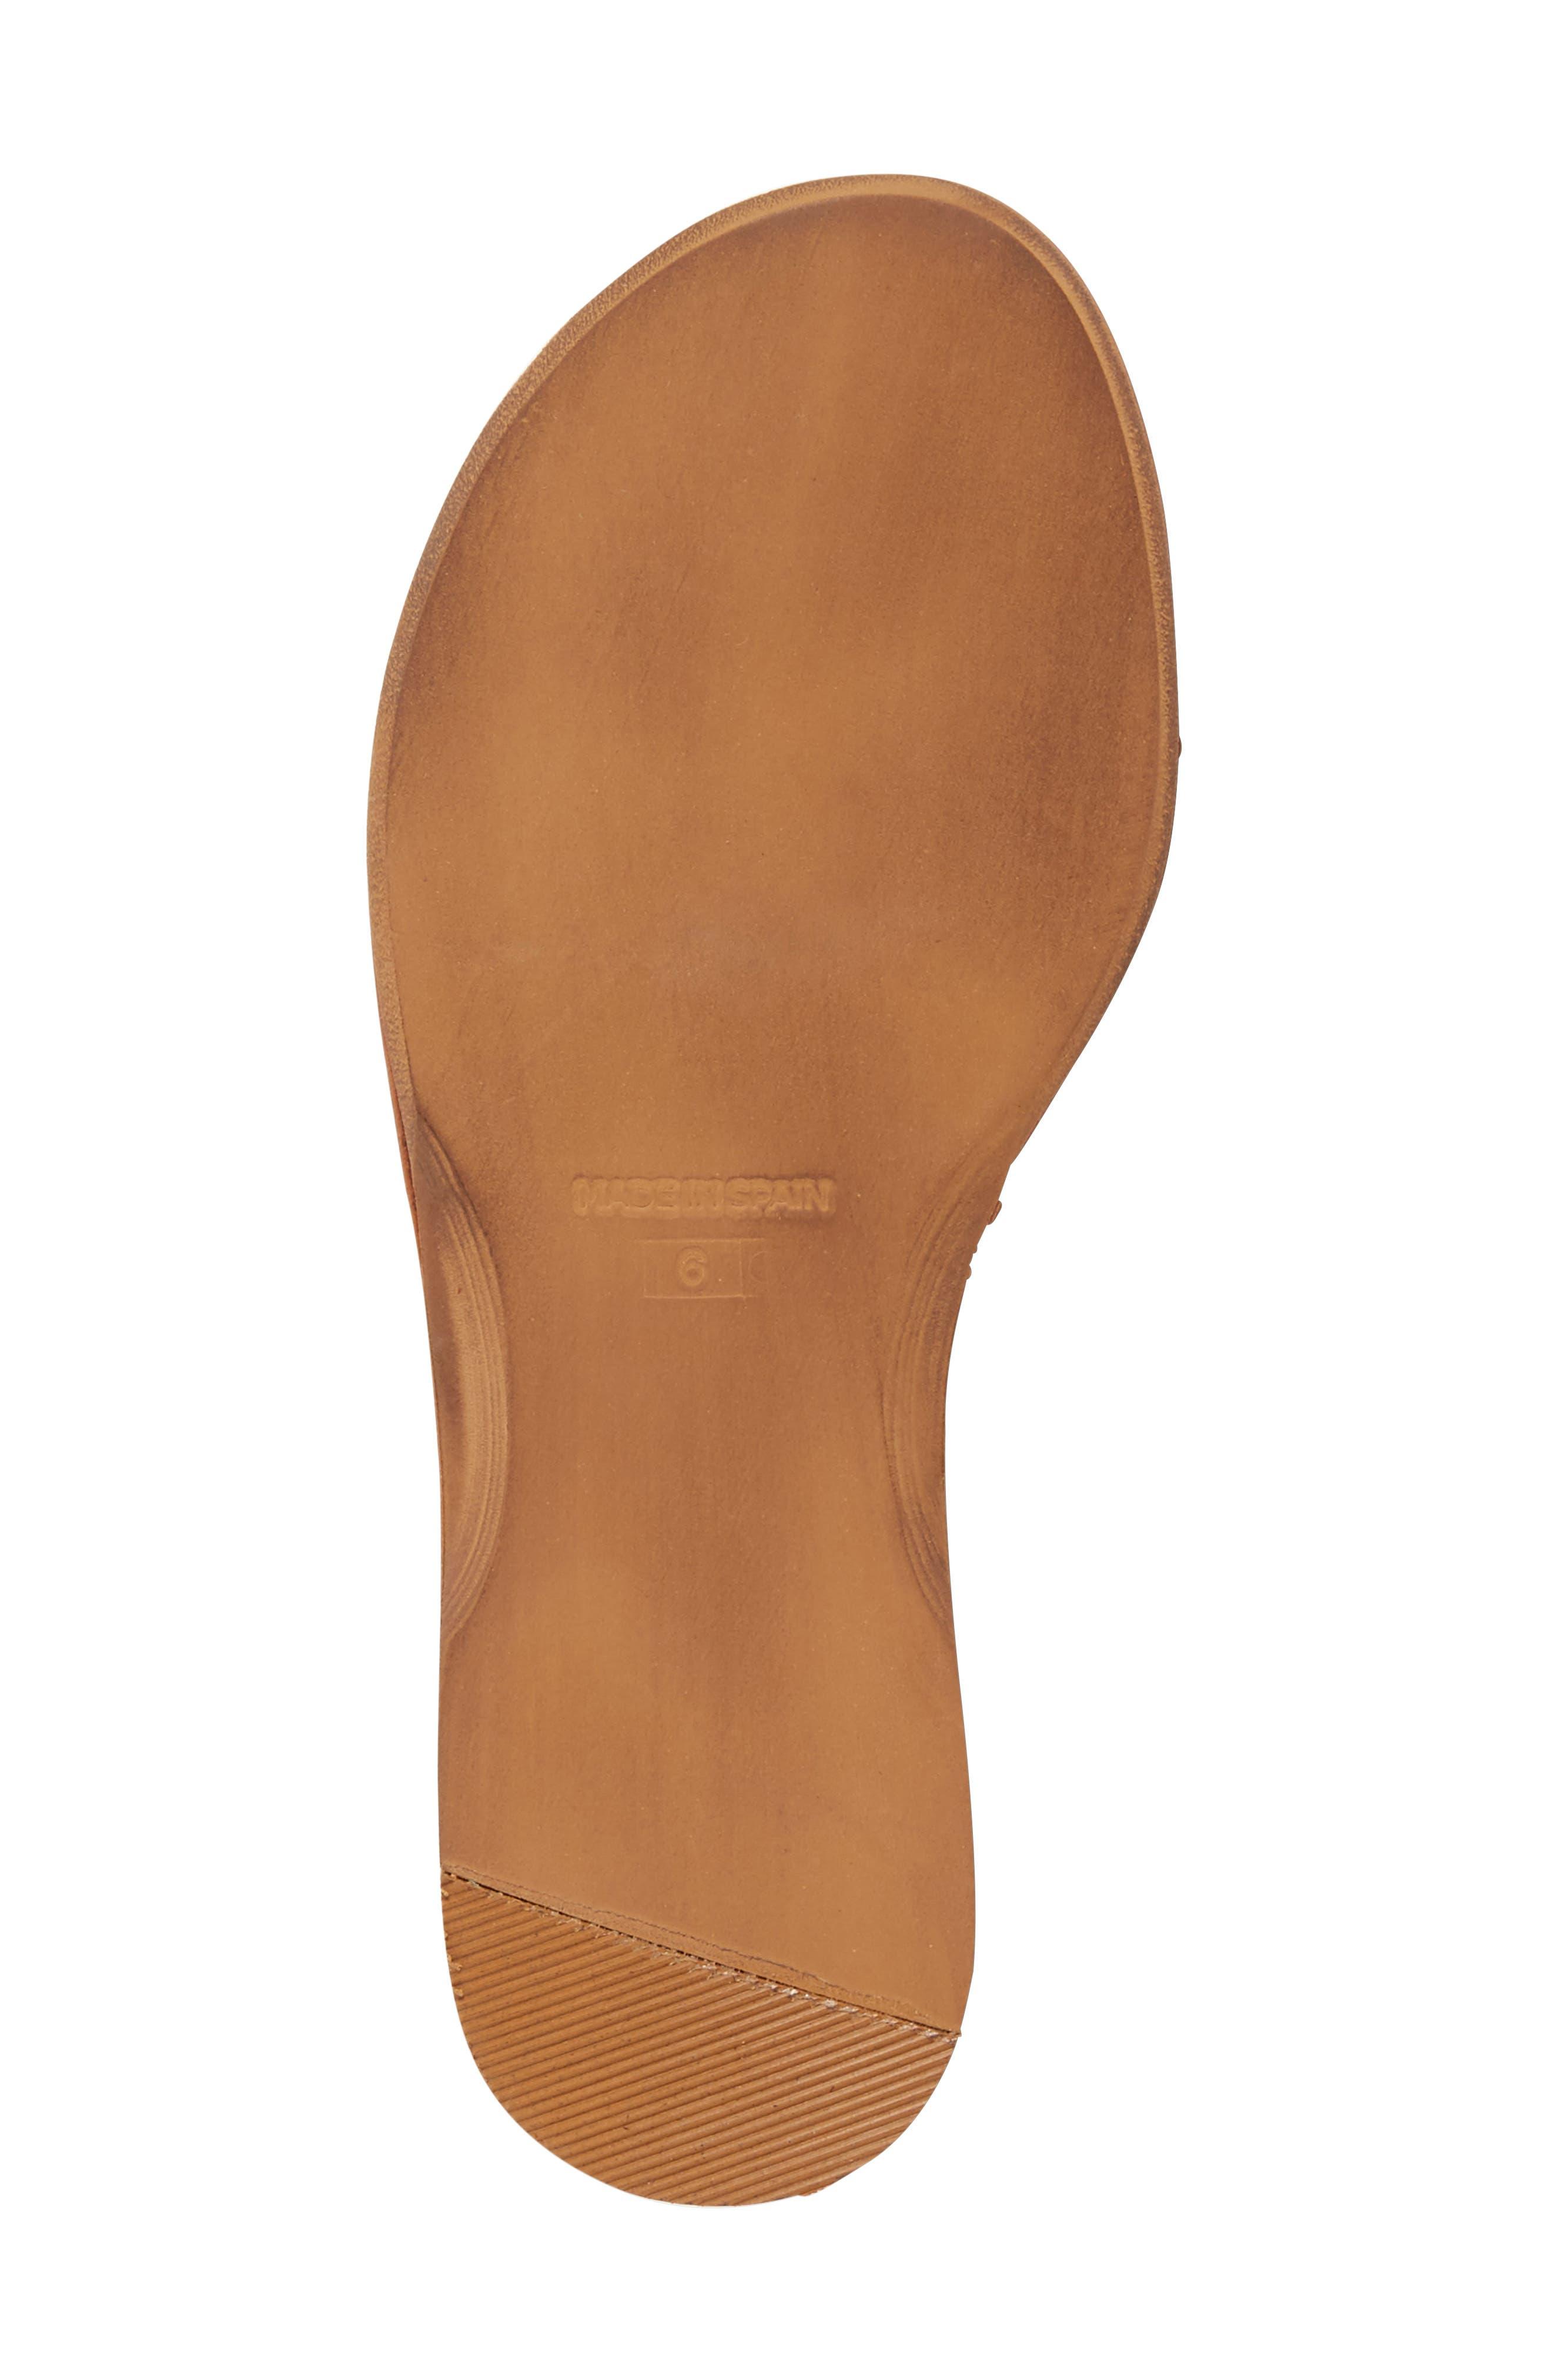 Bronte Tassel Lace-Up Sandal,                             Alternate thumbnail 4, color,                             250